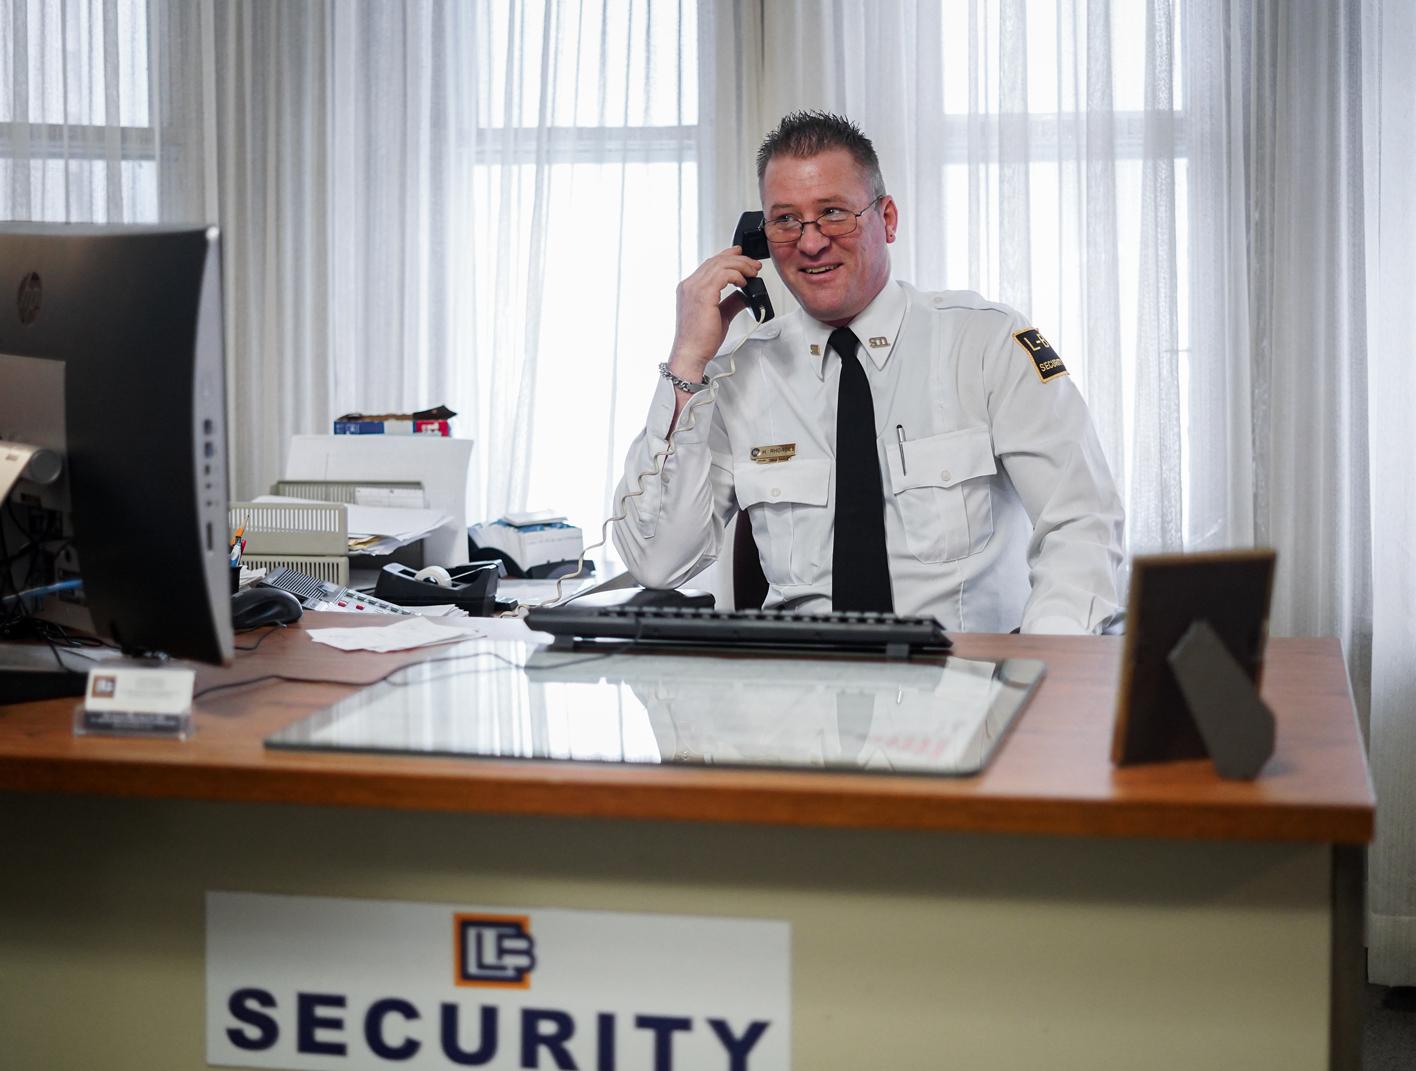 Security Company in Utica, New York